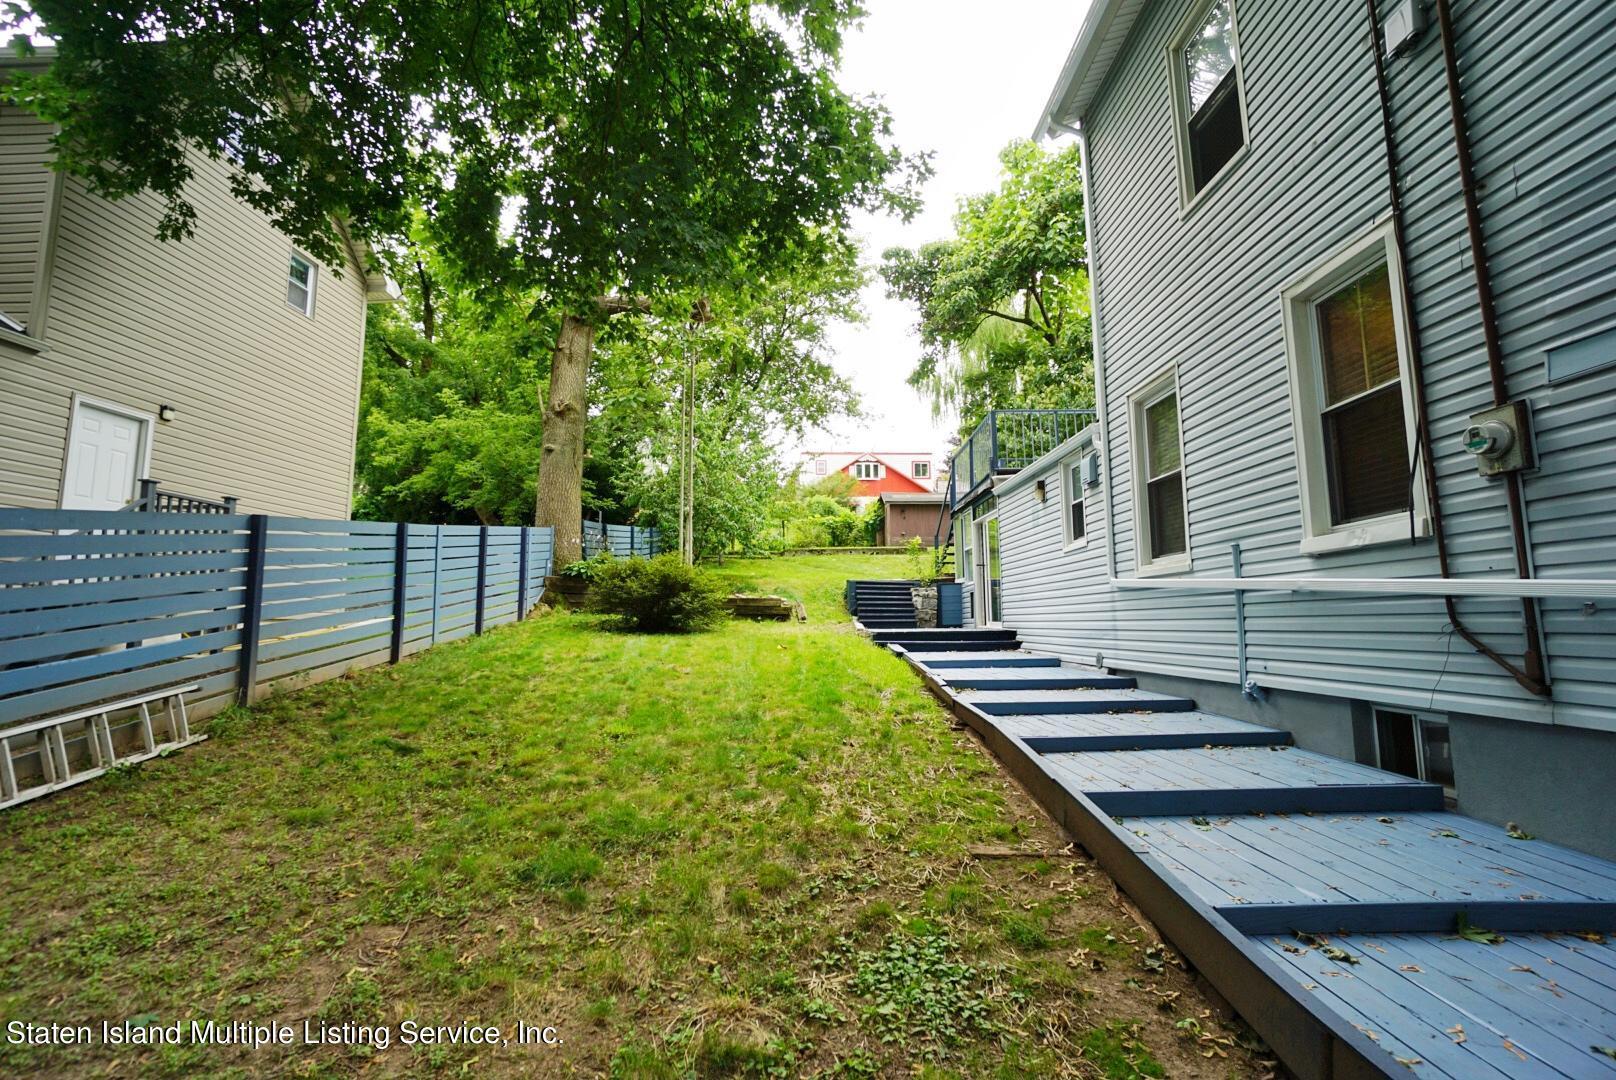 Single Family - Detached 136 York Avenue  Staten Island, NY 10301, MLS-1147575-49